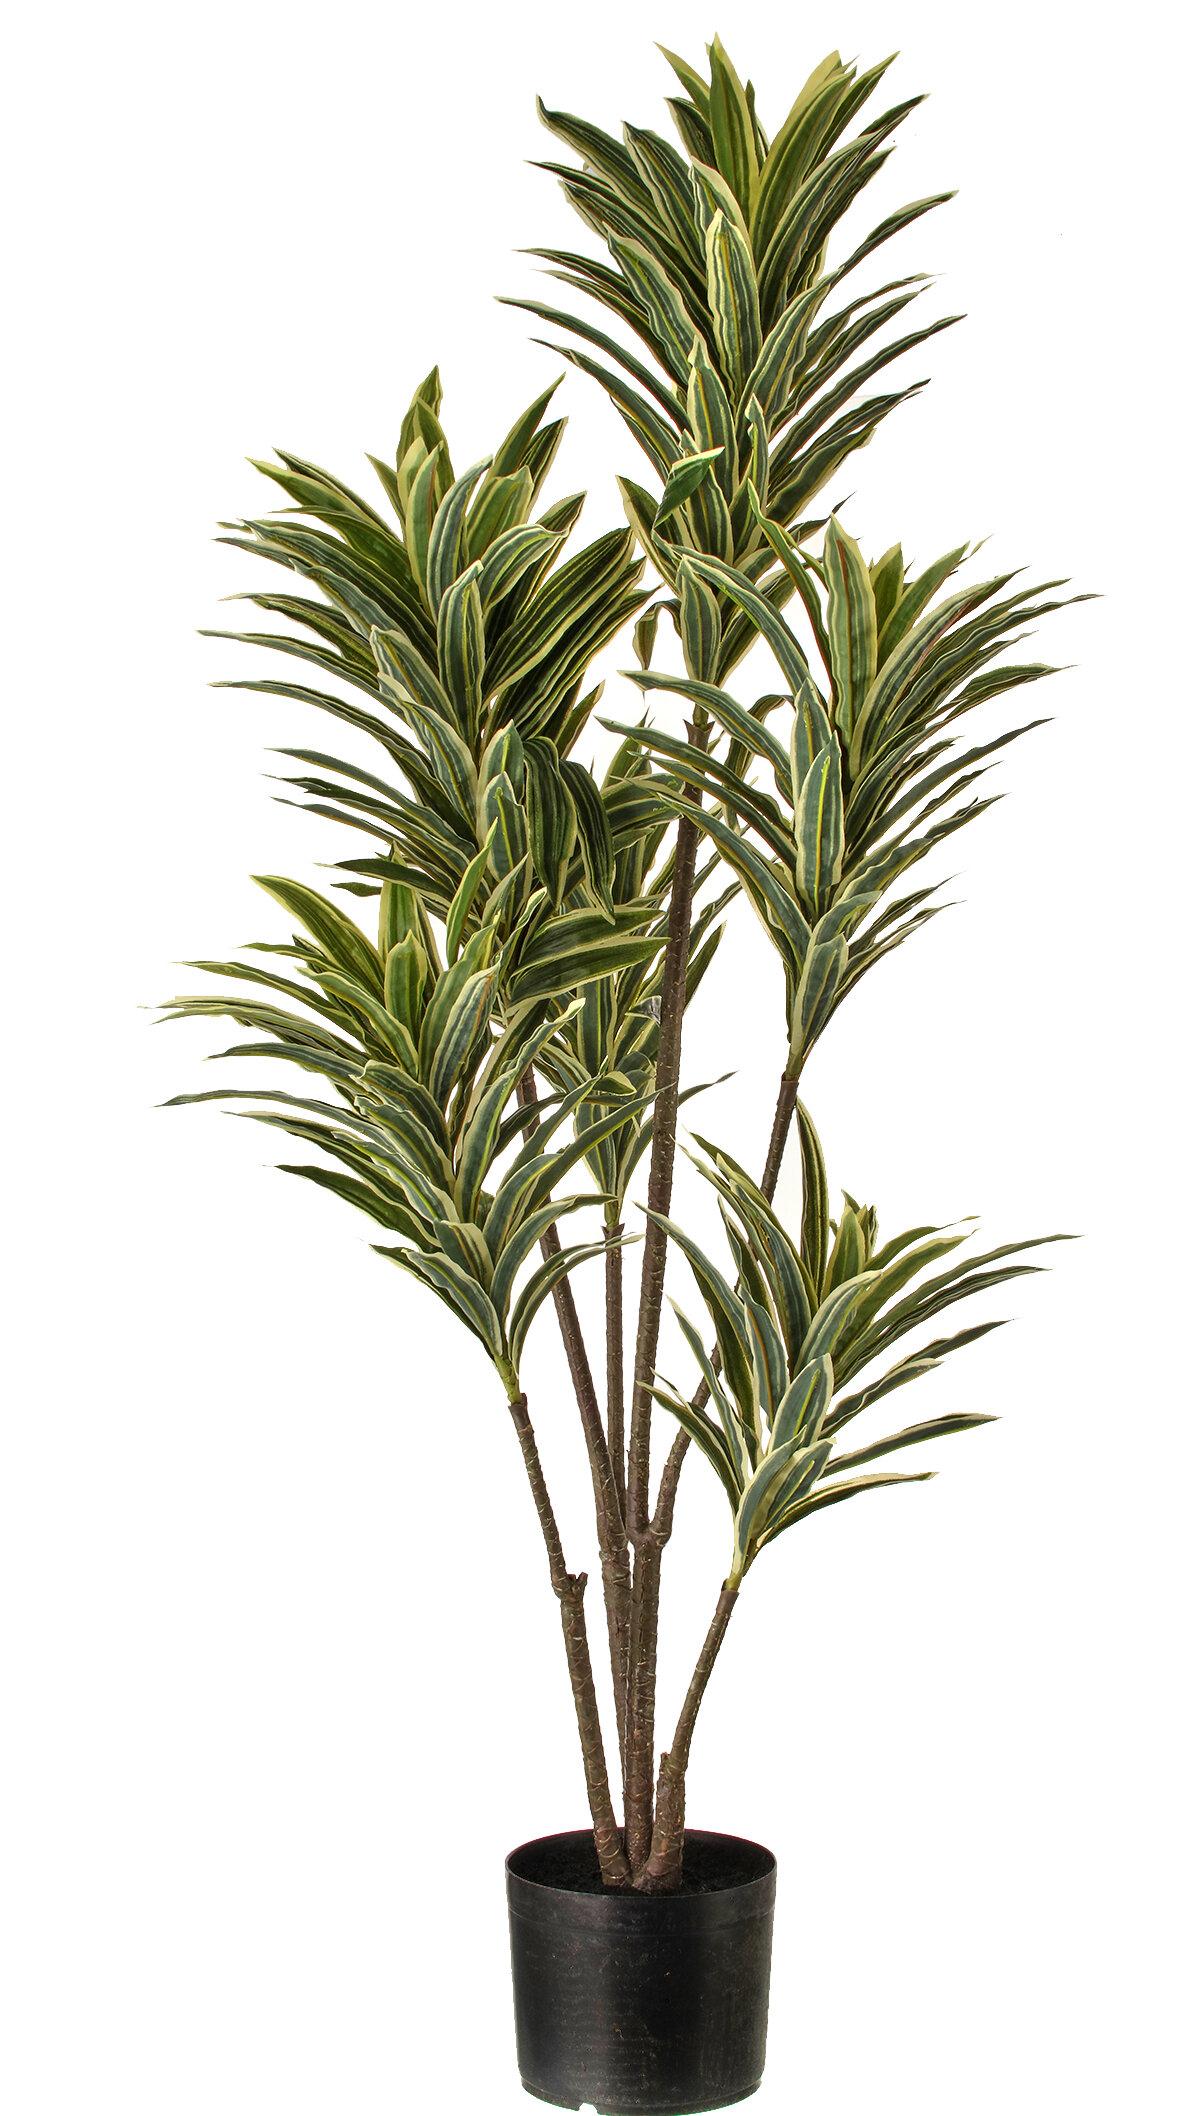 Ebern Designs 40 Artificial Dracaena Tree In Pot Wayfair